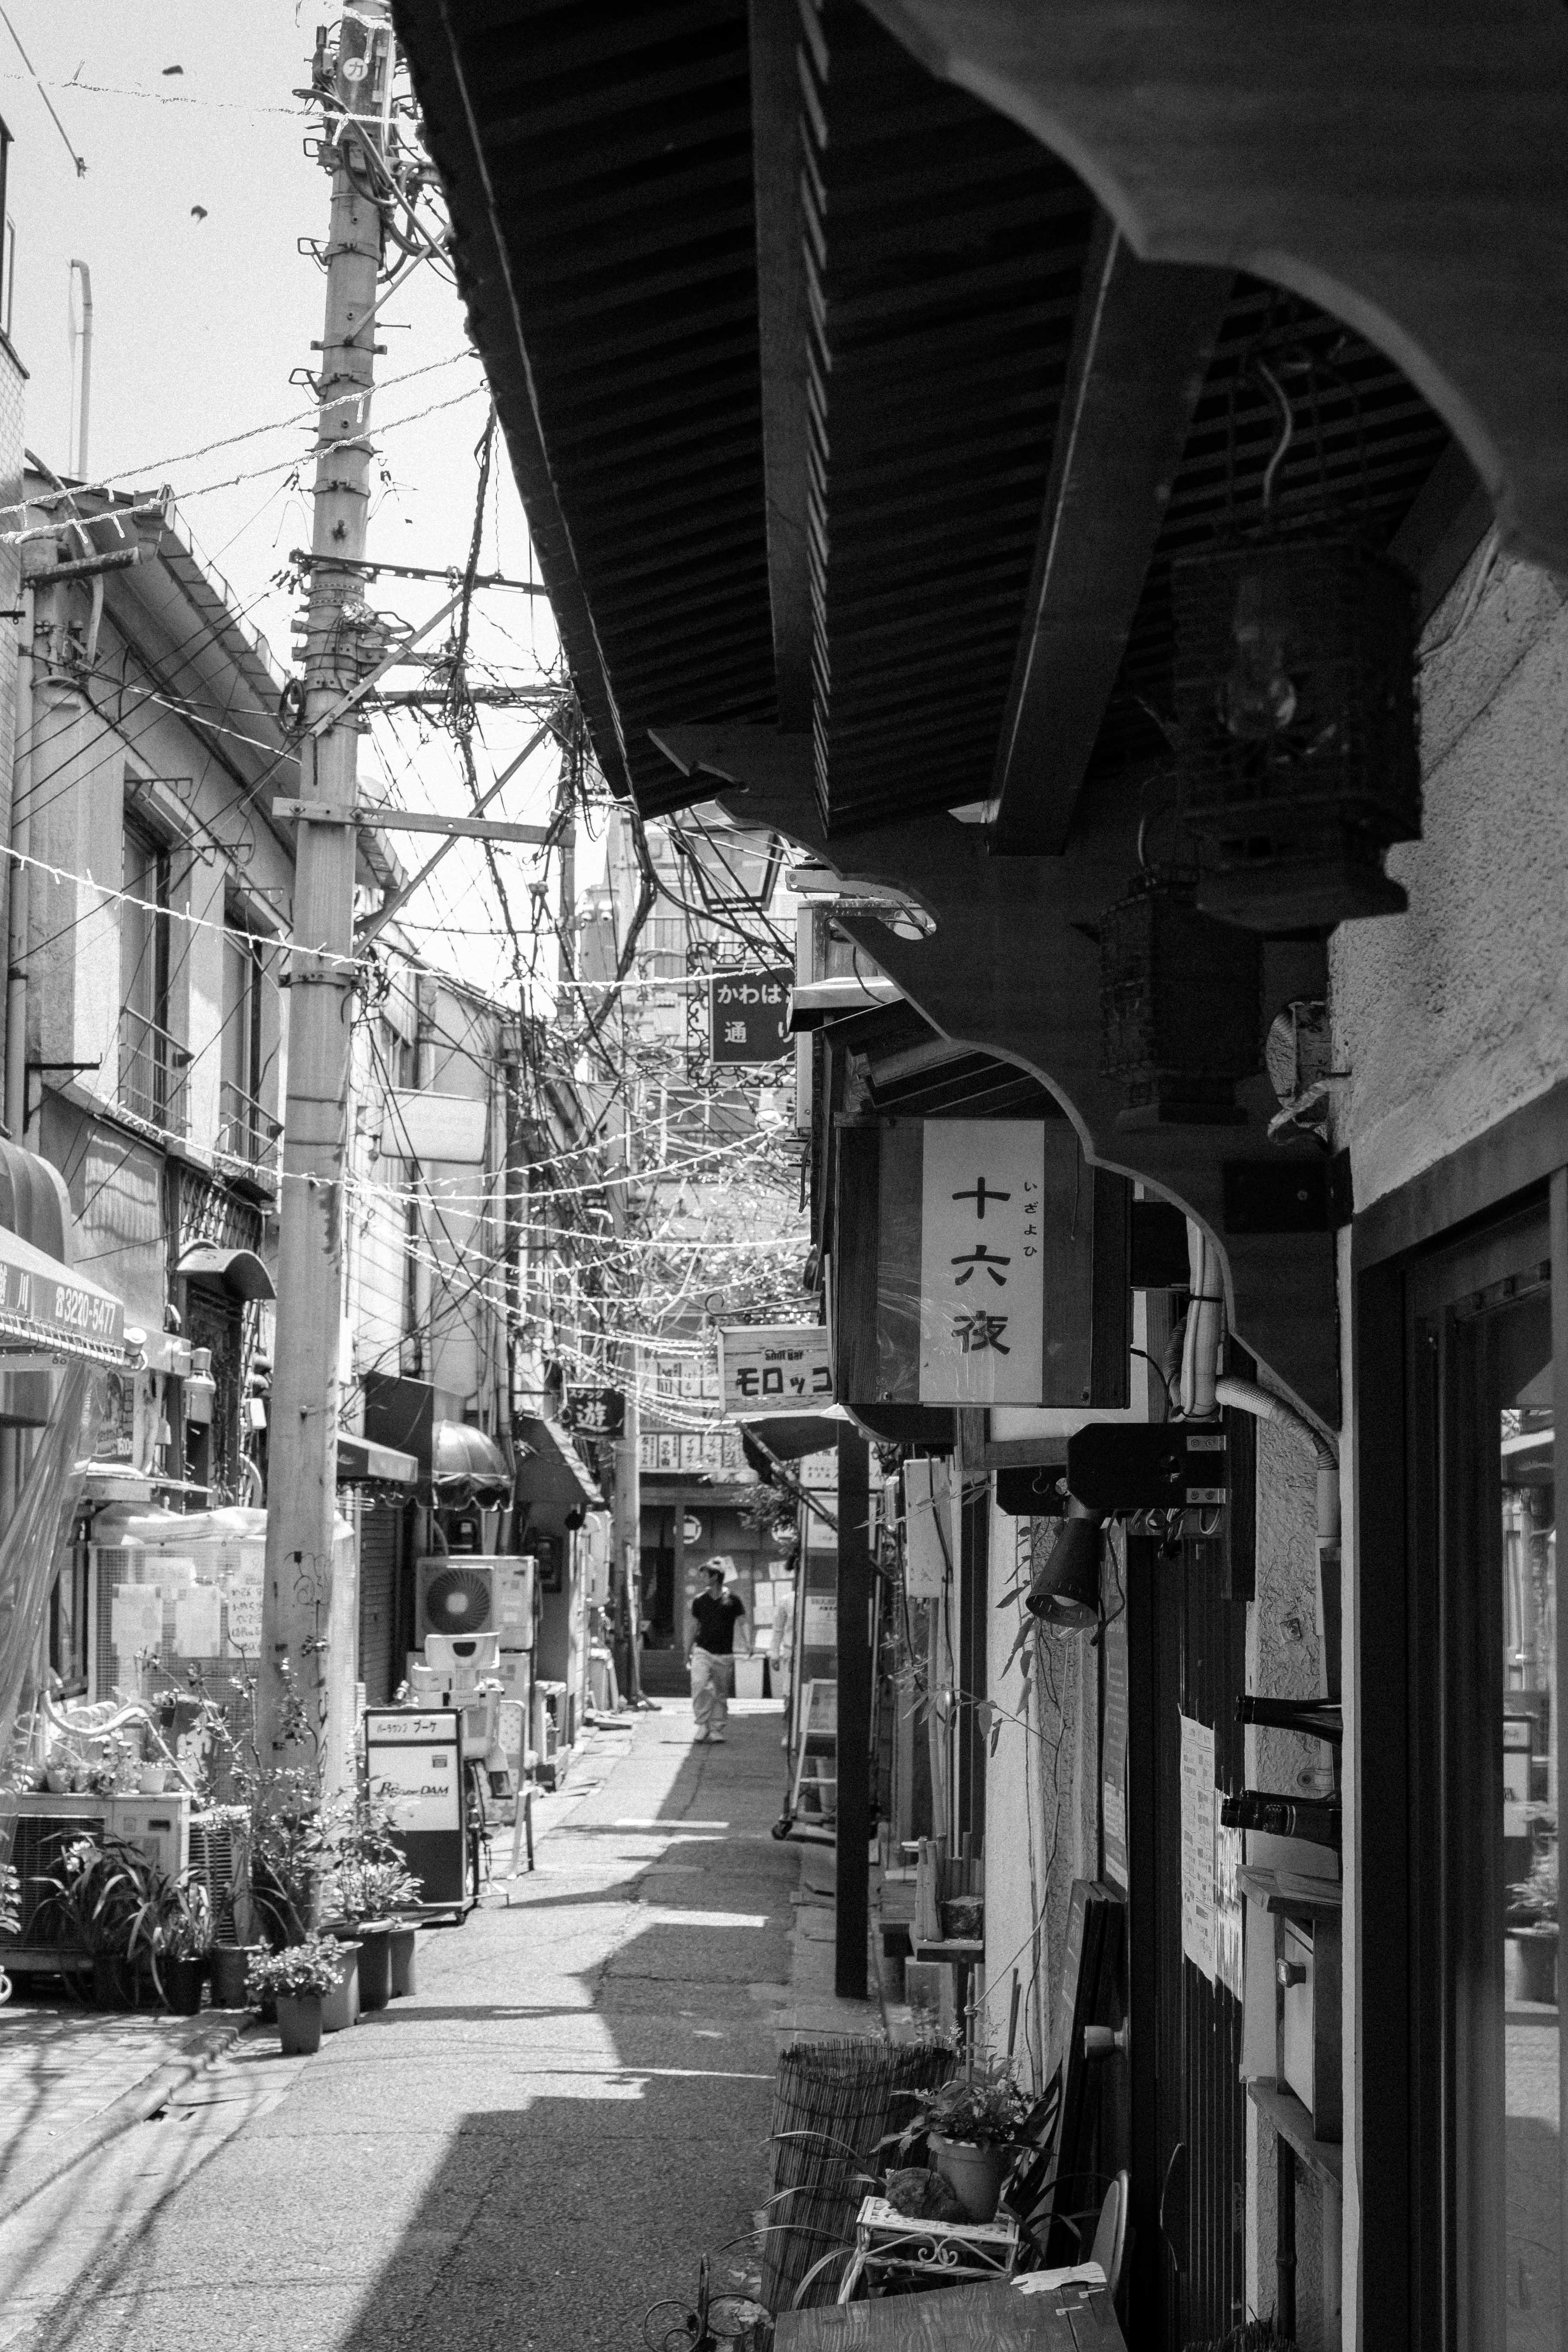 阿佐ヶ谷散策(11)